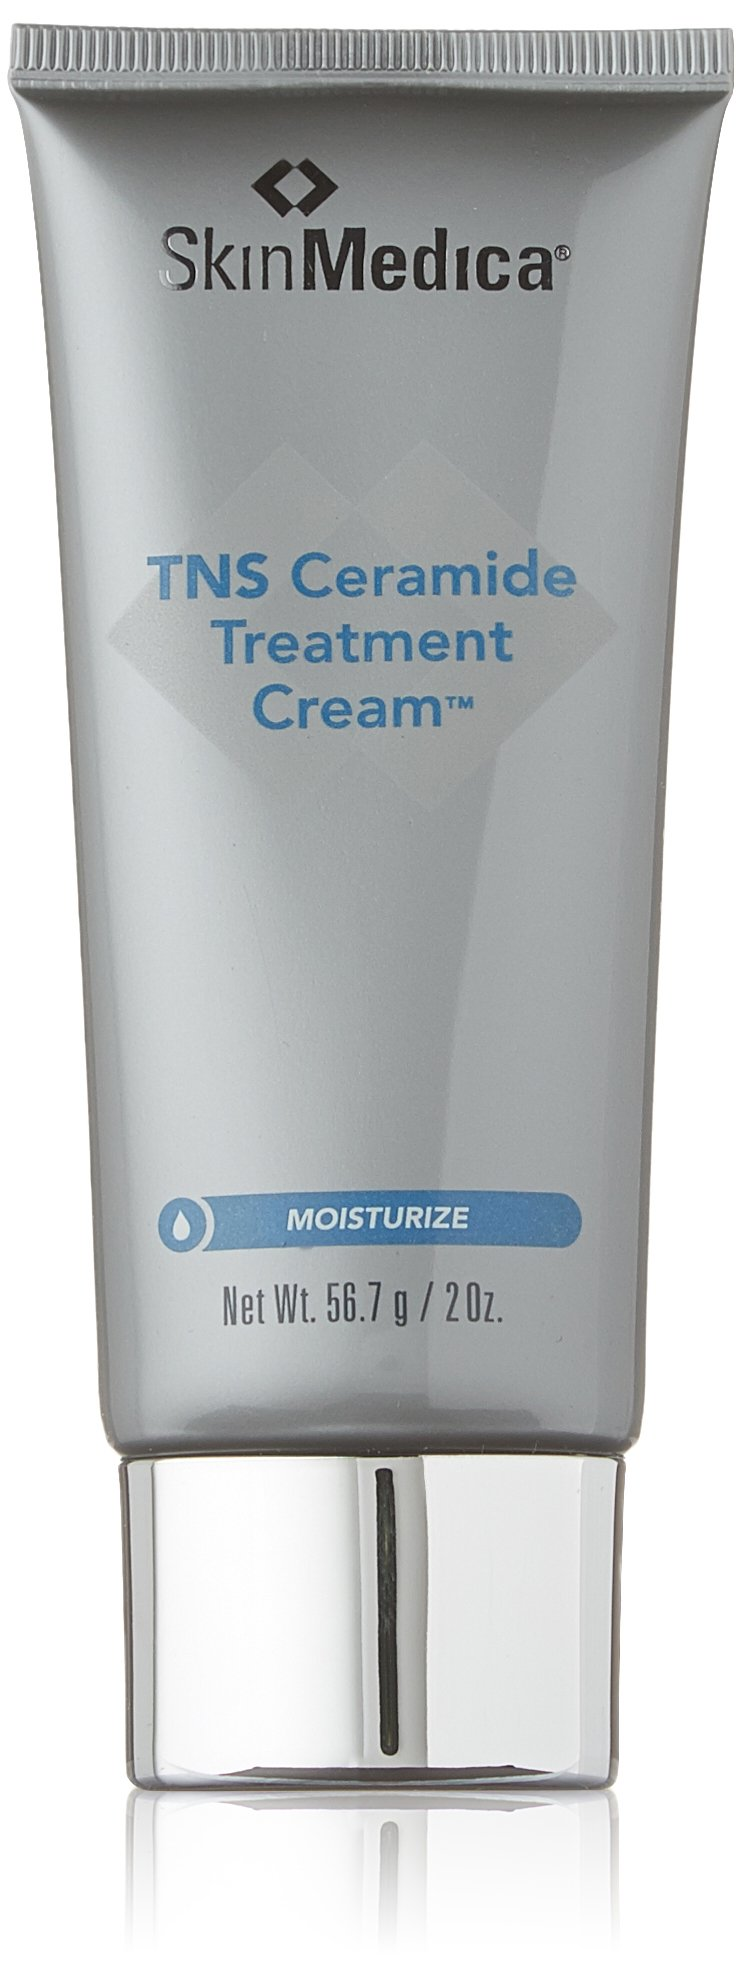 Skinmedica TNS Ceramide Treatment Cream, 2.0 Ounce